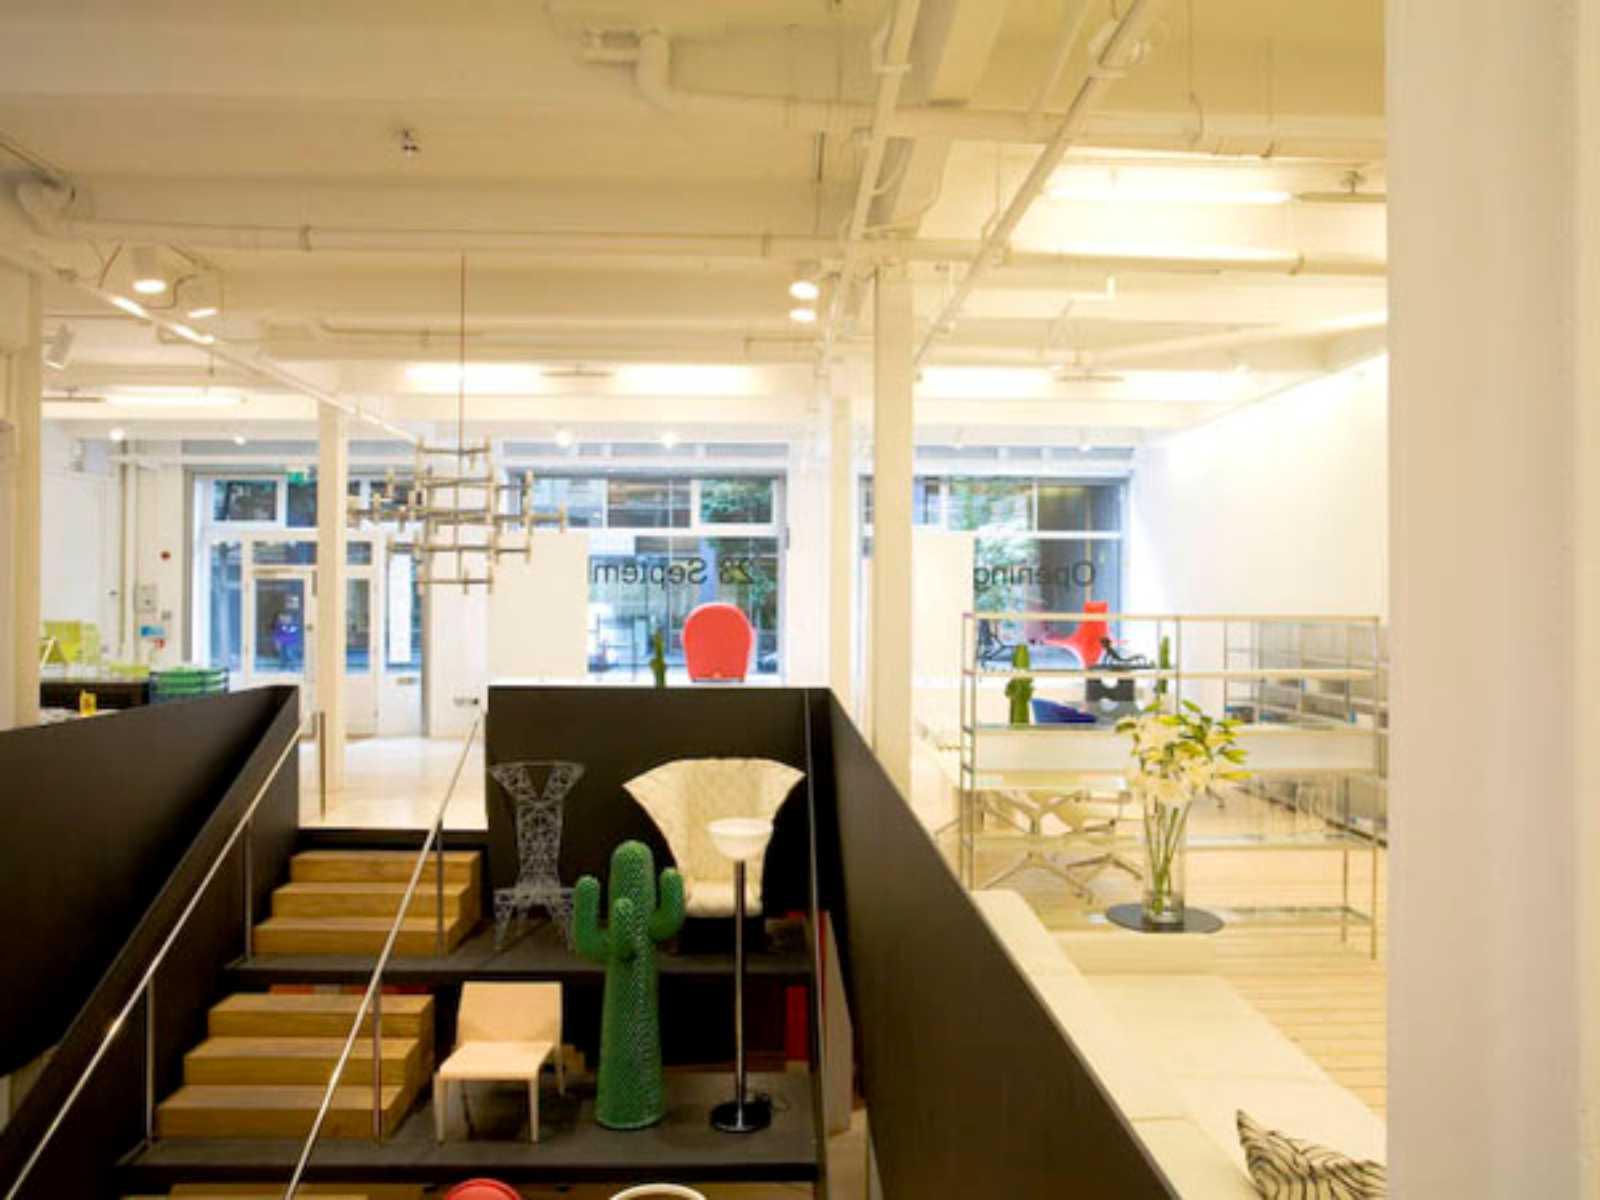 Poltrona Studio.Poltrona Frau Showroom By Universal Design Studio Aasarchitecture